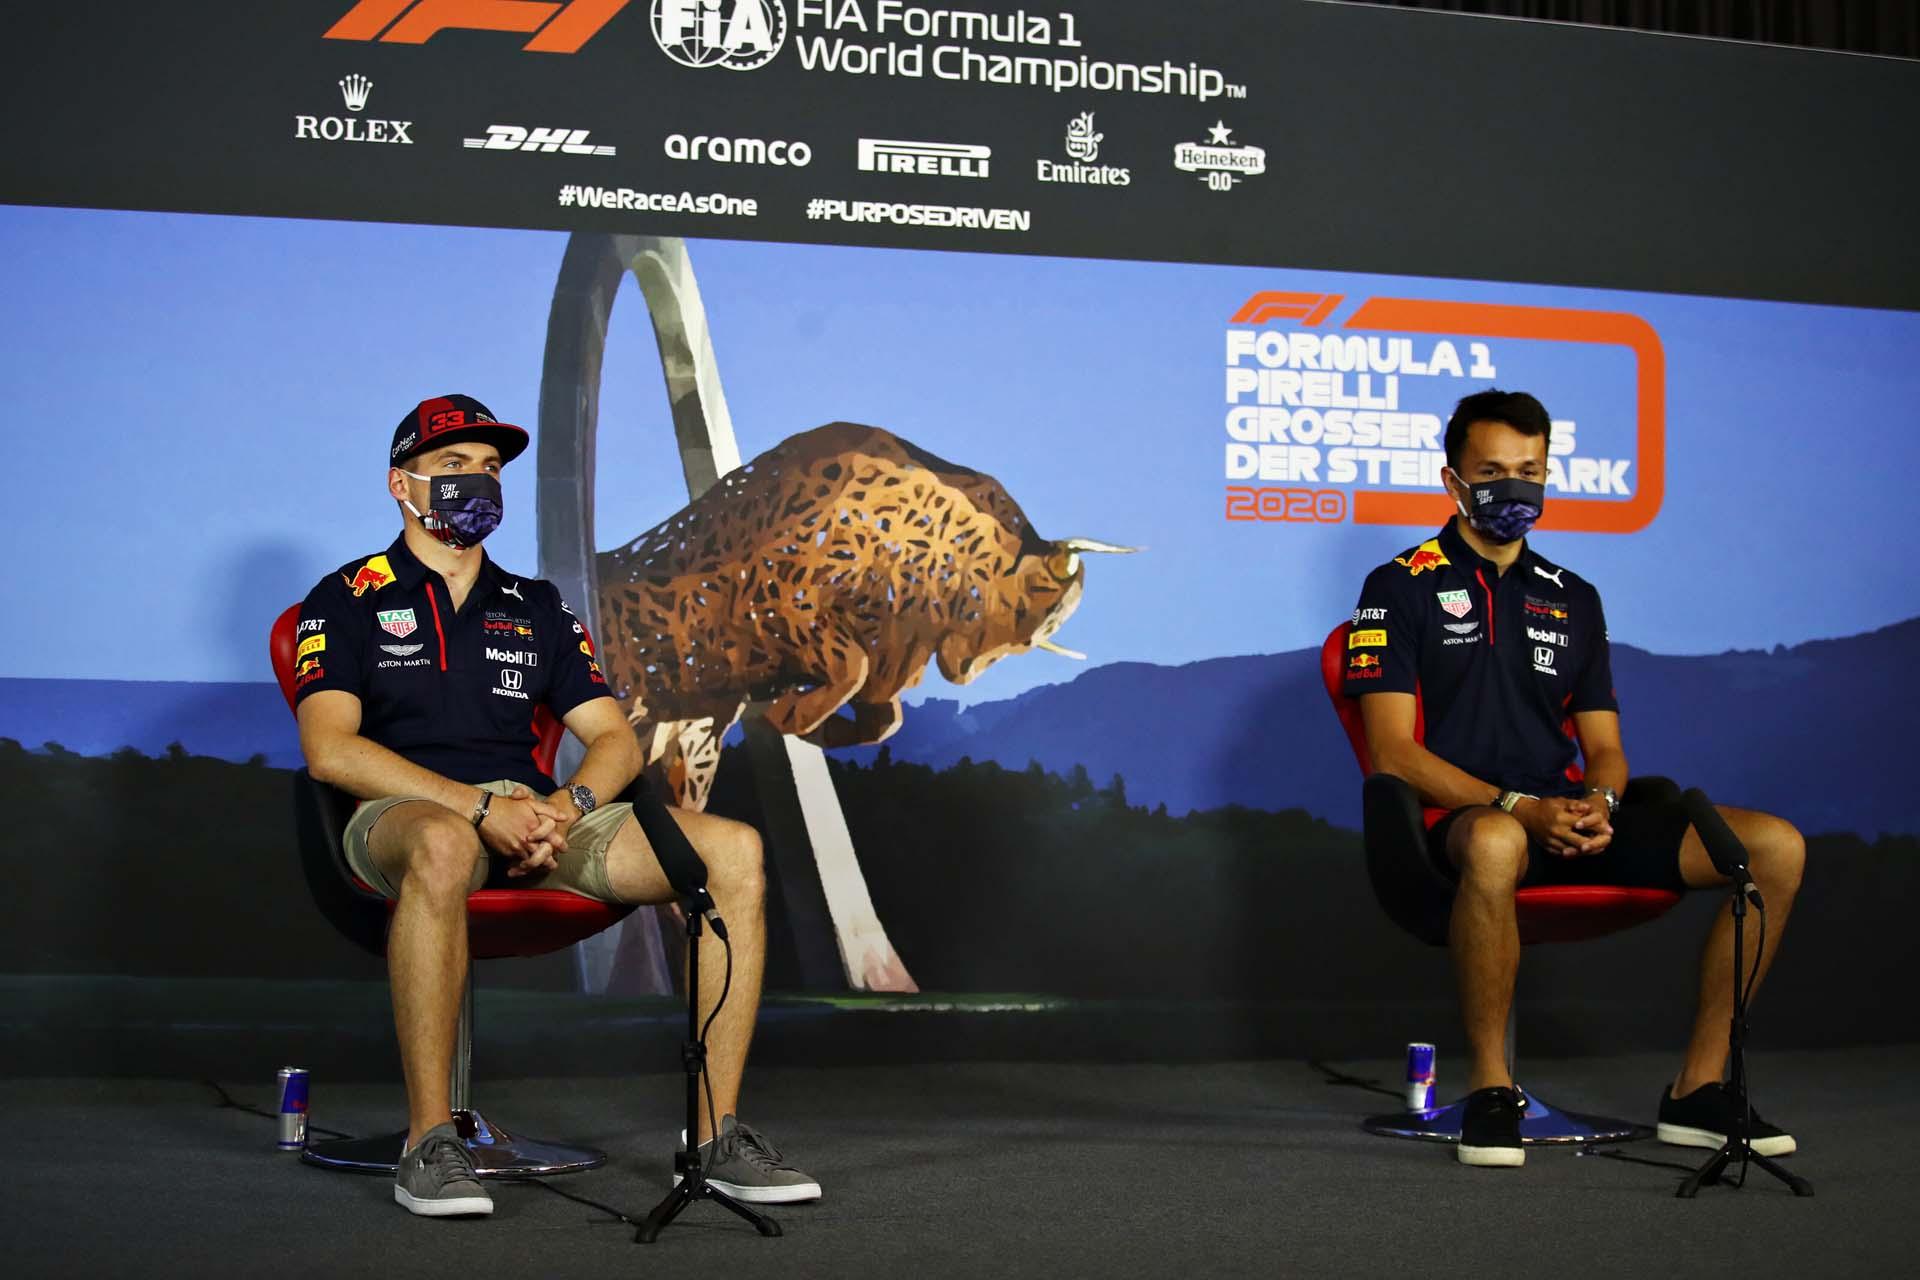 F1 Grand Prix of Styria - Previews